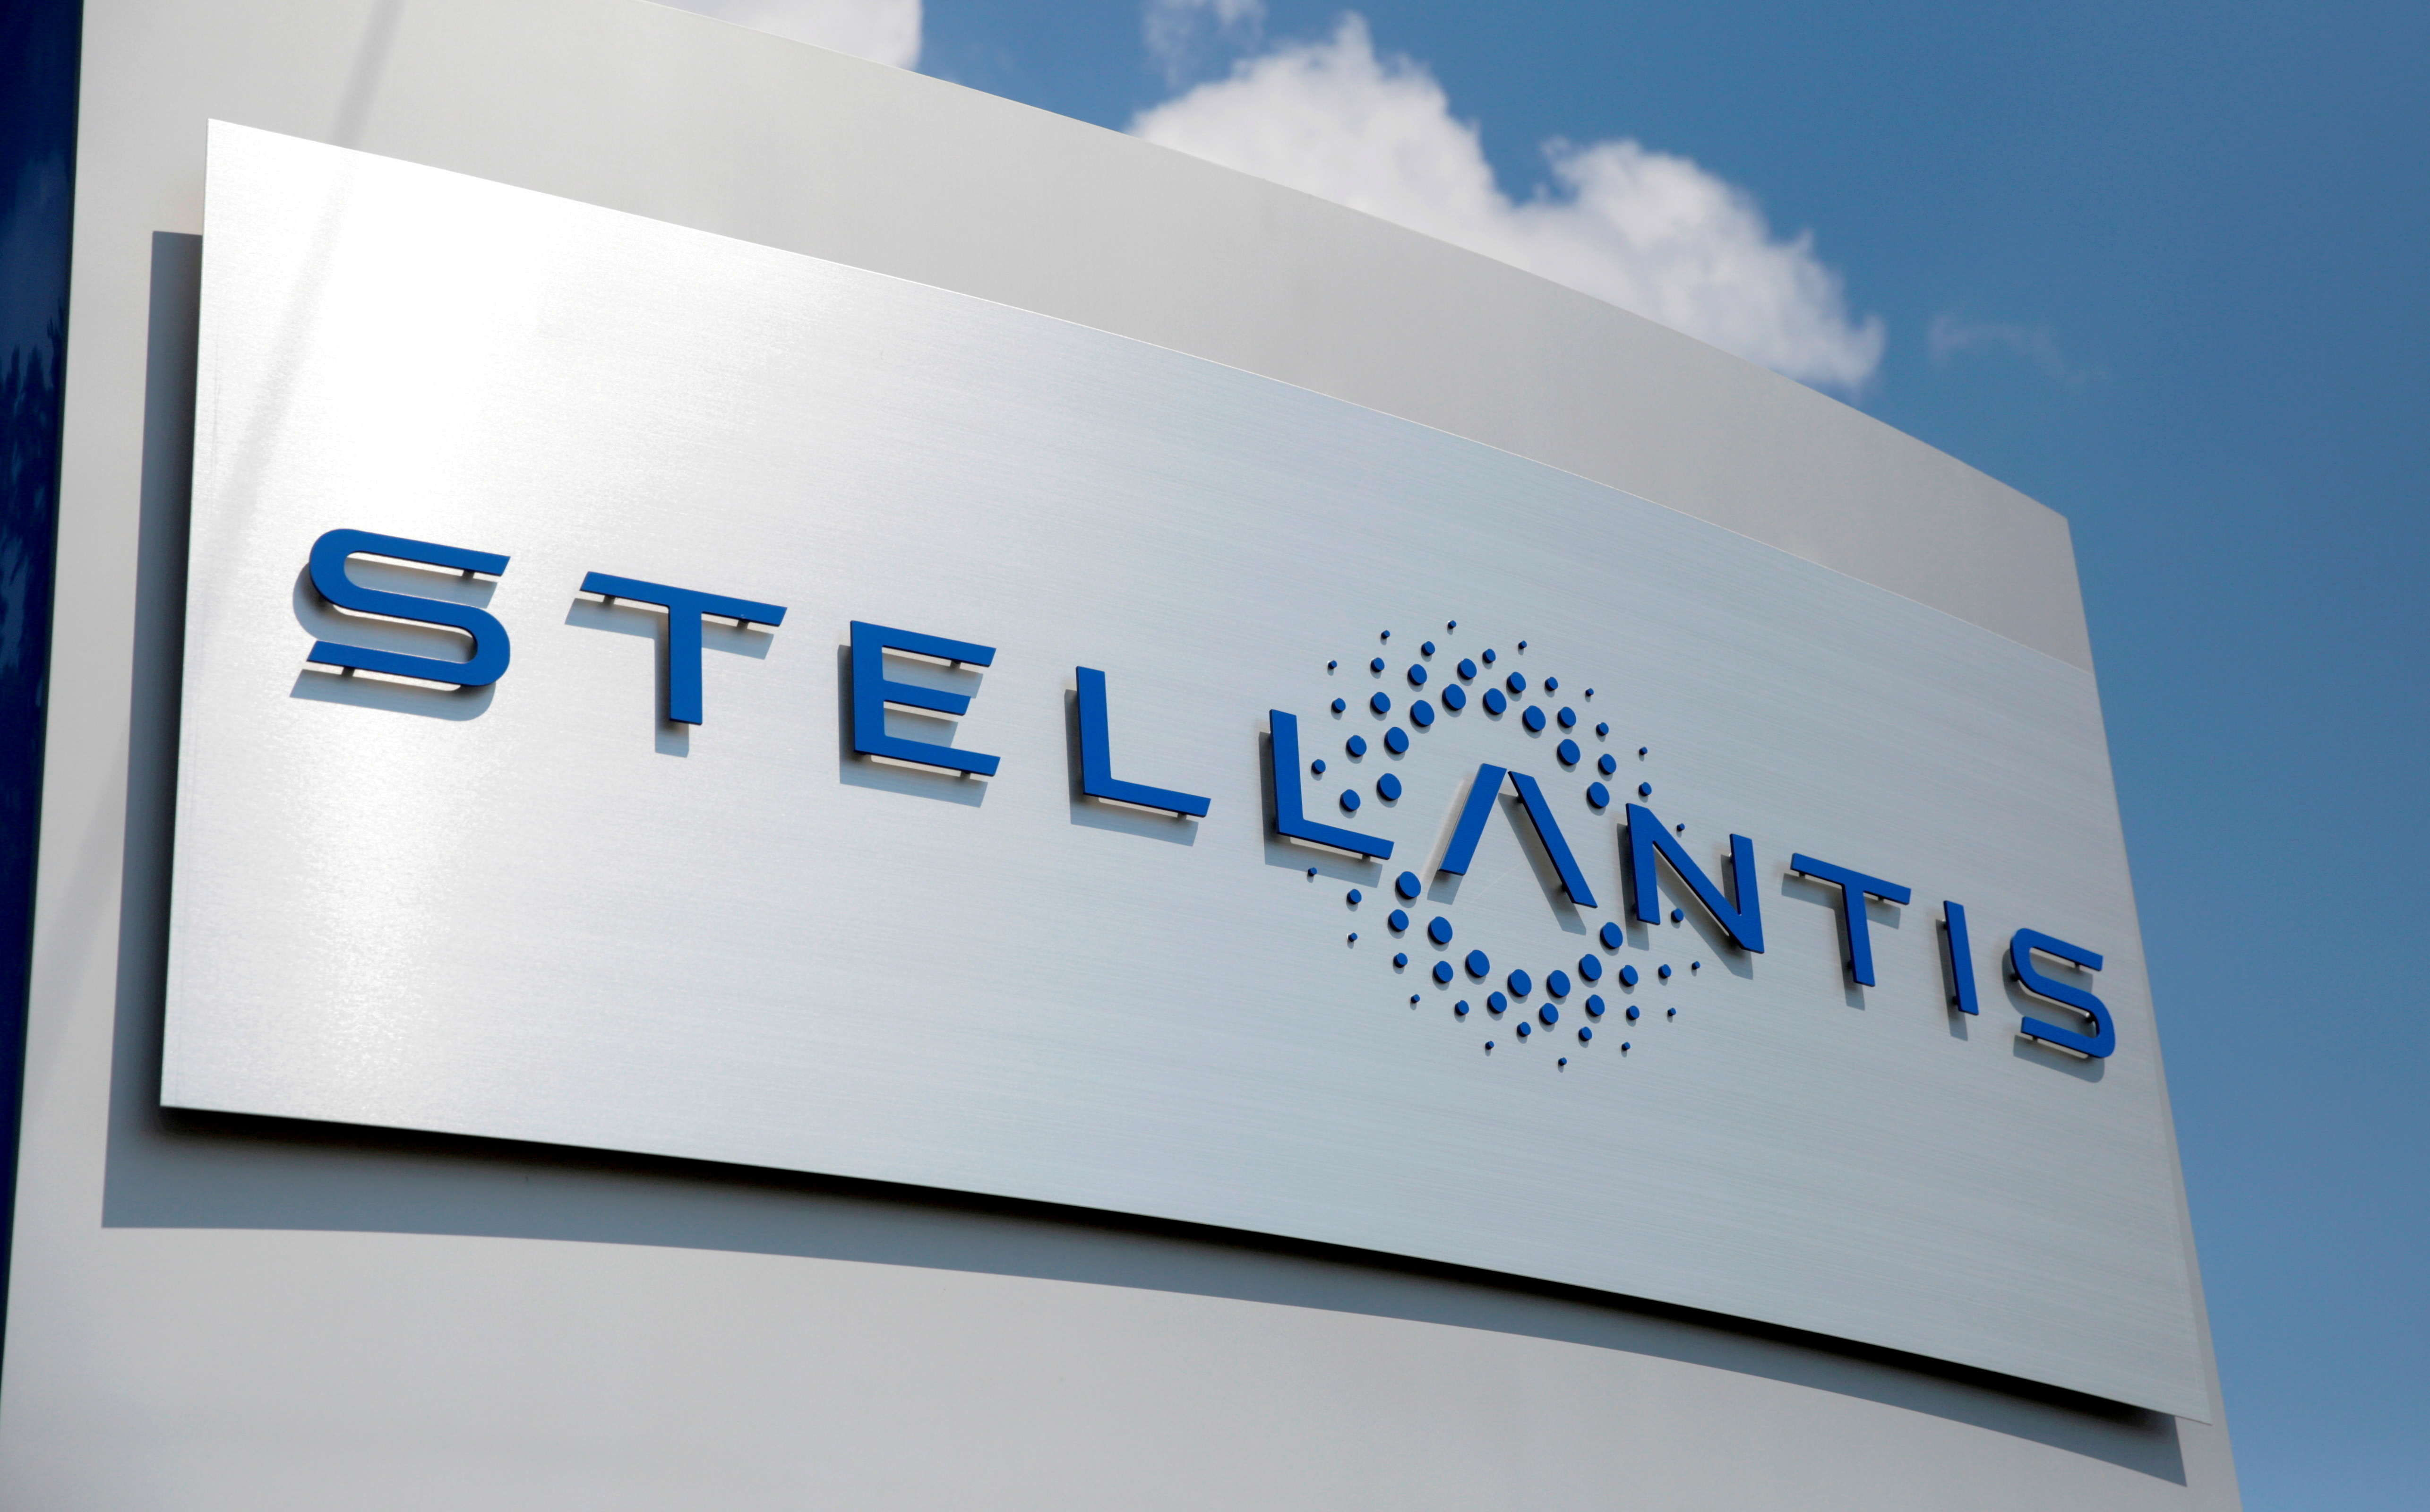 A Stellantis sign is seen outside the company's headquarters in Auburn Hills, Michigan, U.S., June 10, 2021.   REUTERS/Rebecca Cook